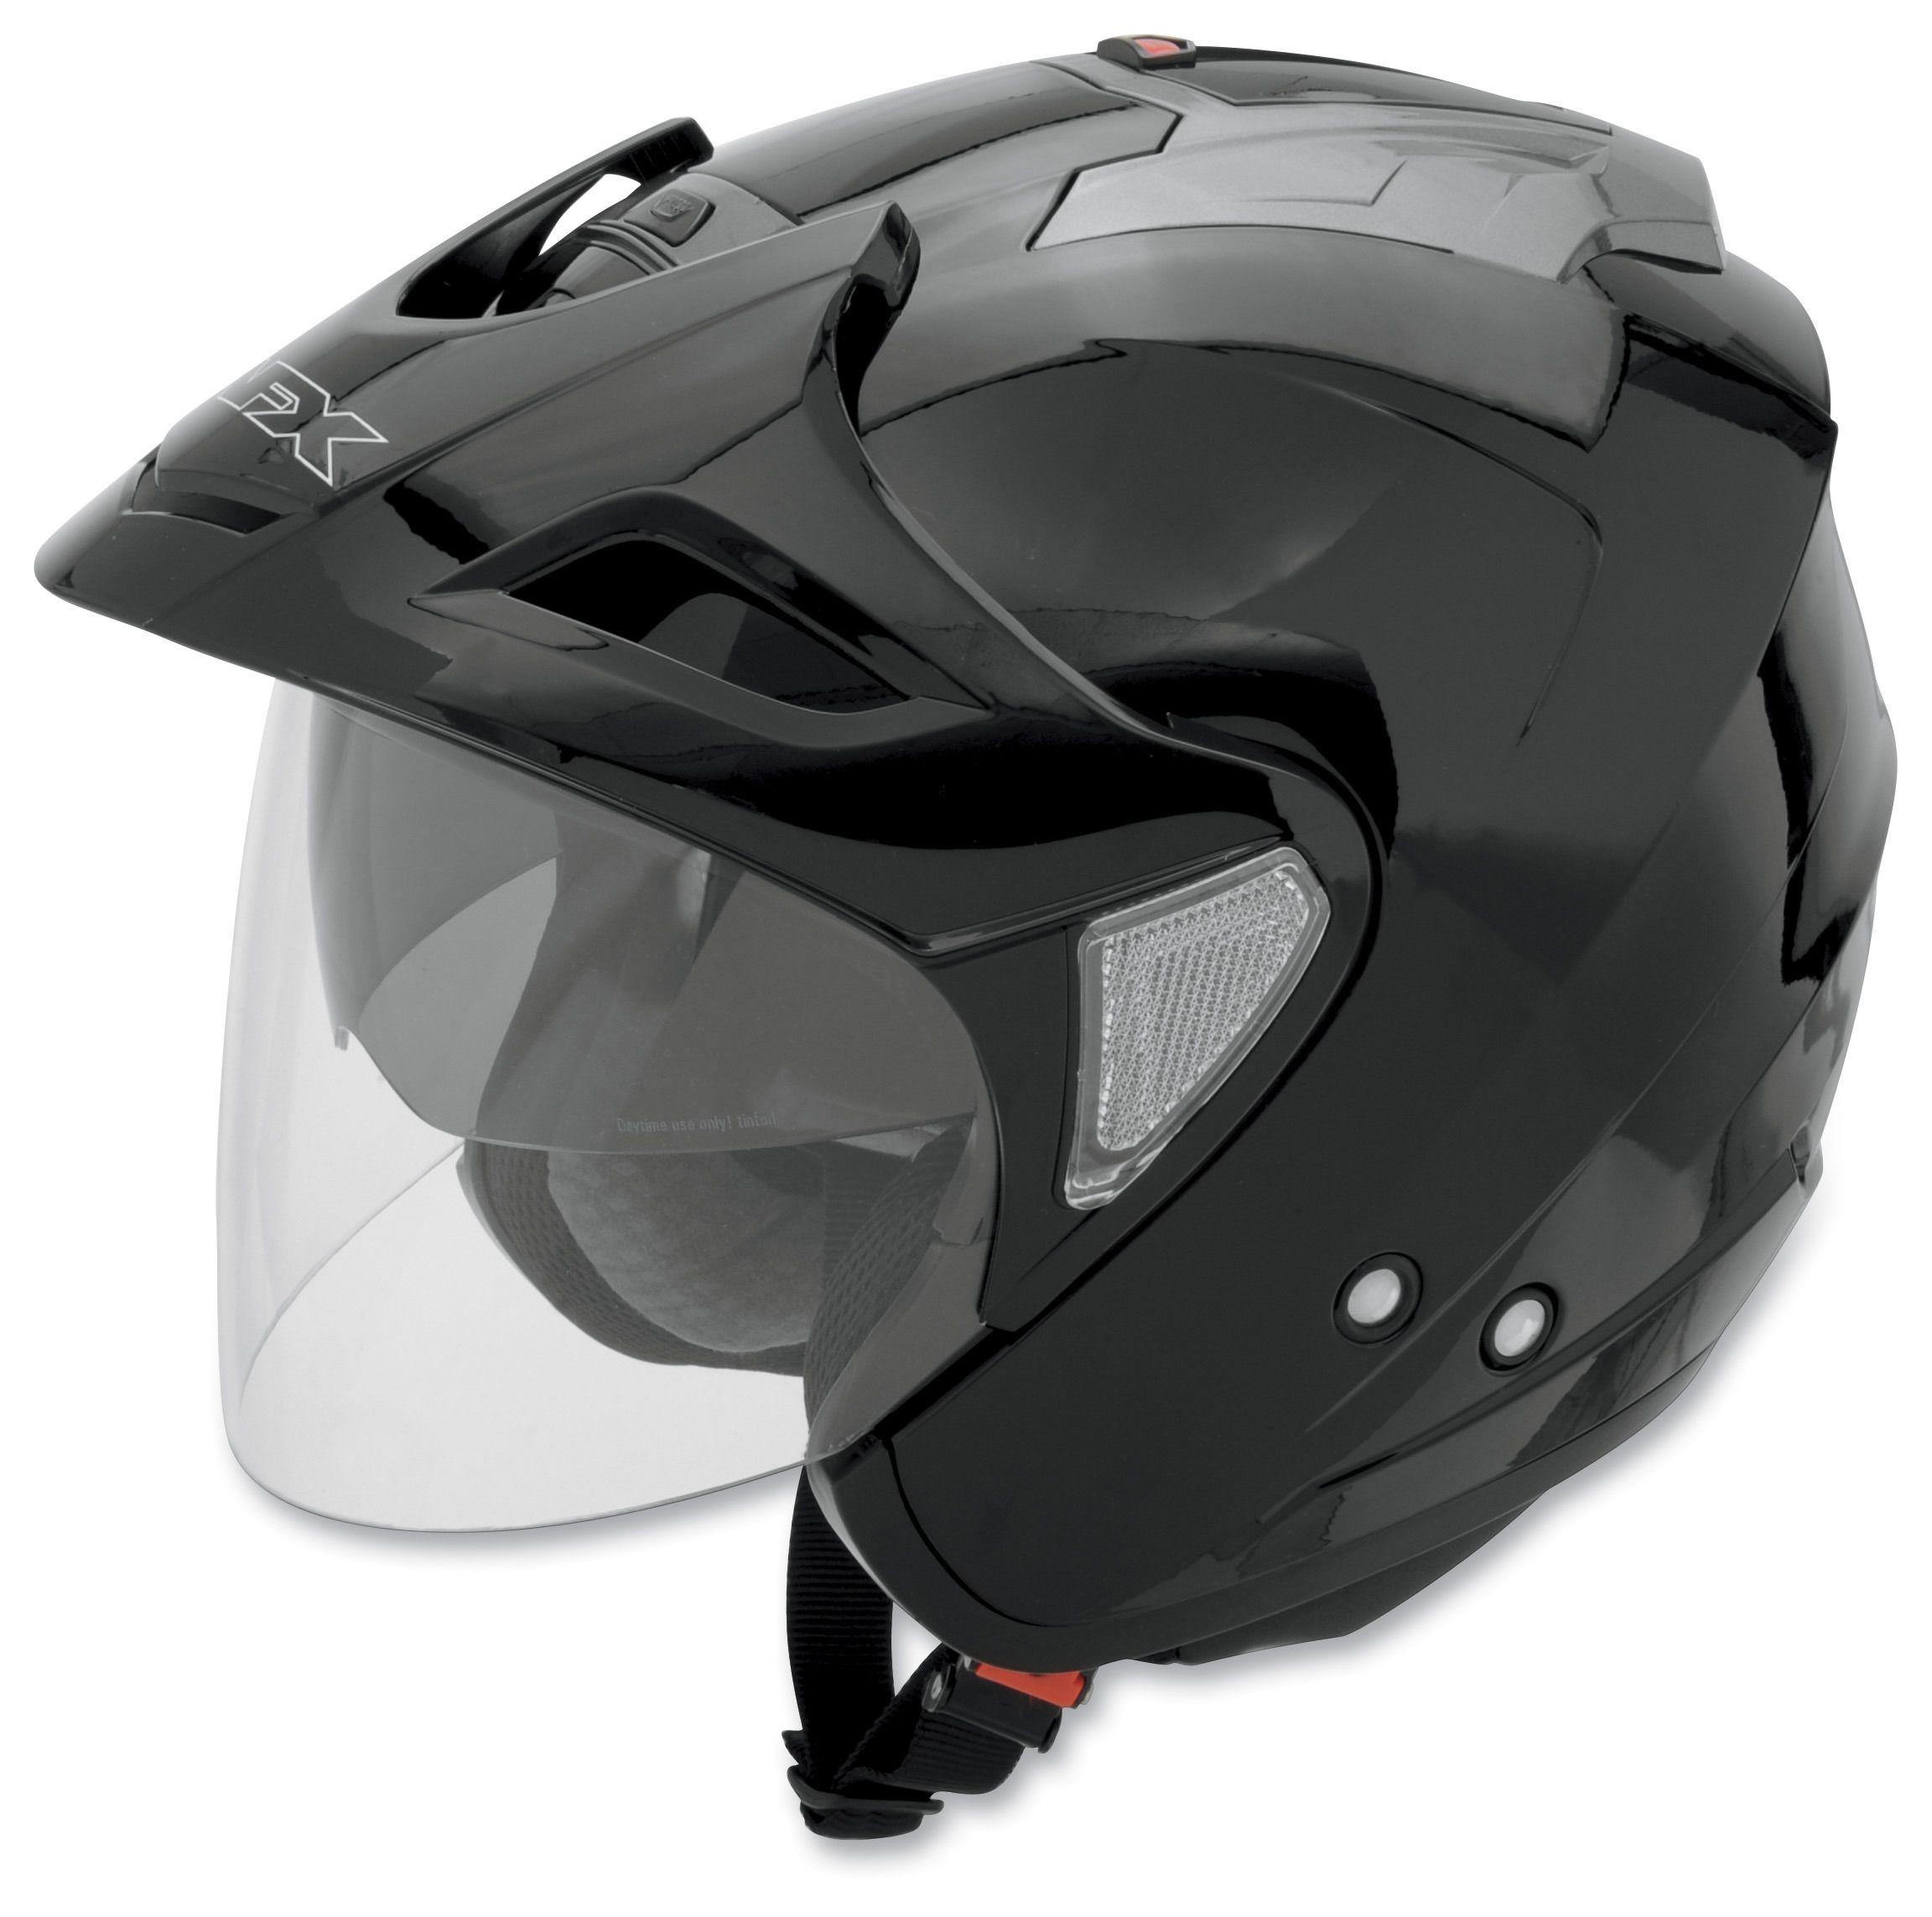 Afx Fx 50 Helmet Revzilla